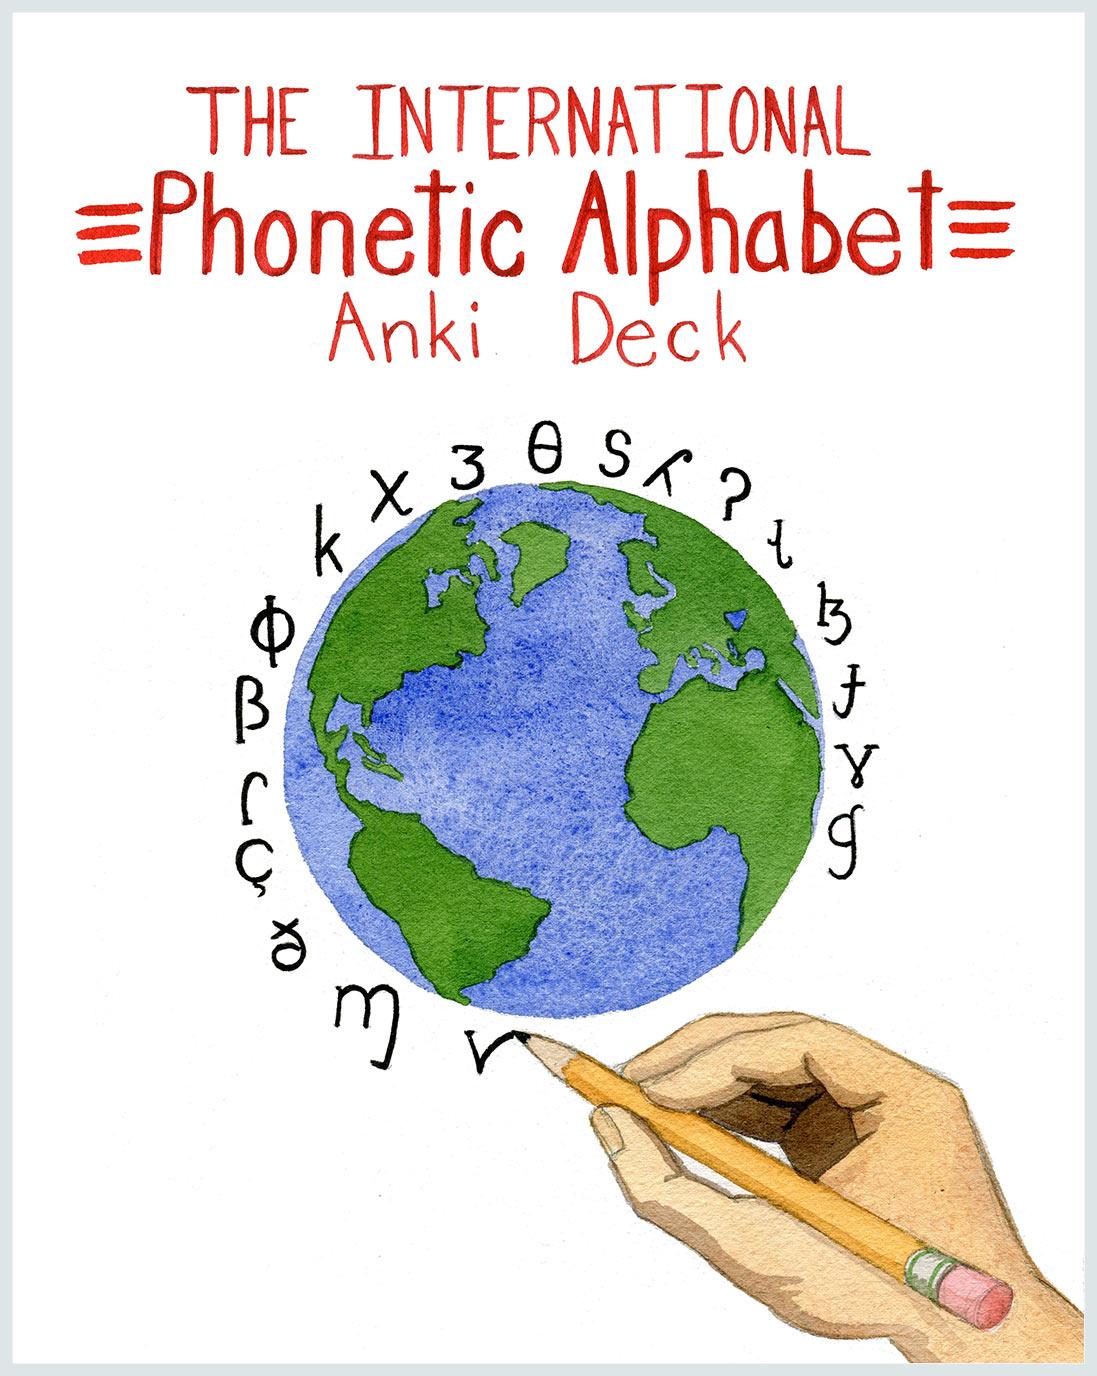 The International Phonetic Alphabet (IPA) Anki Deck